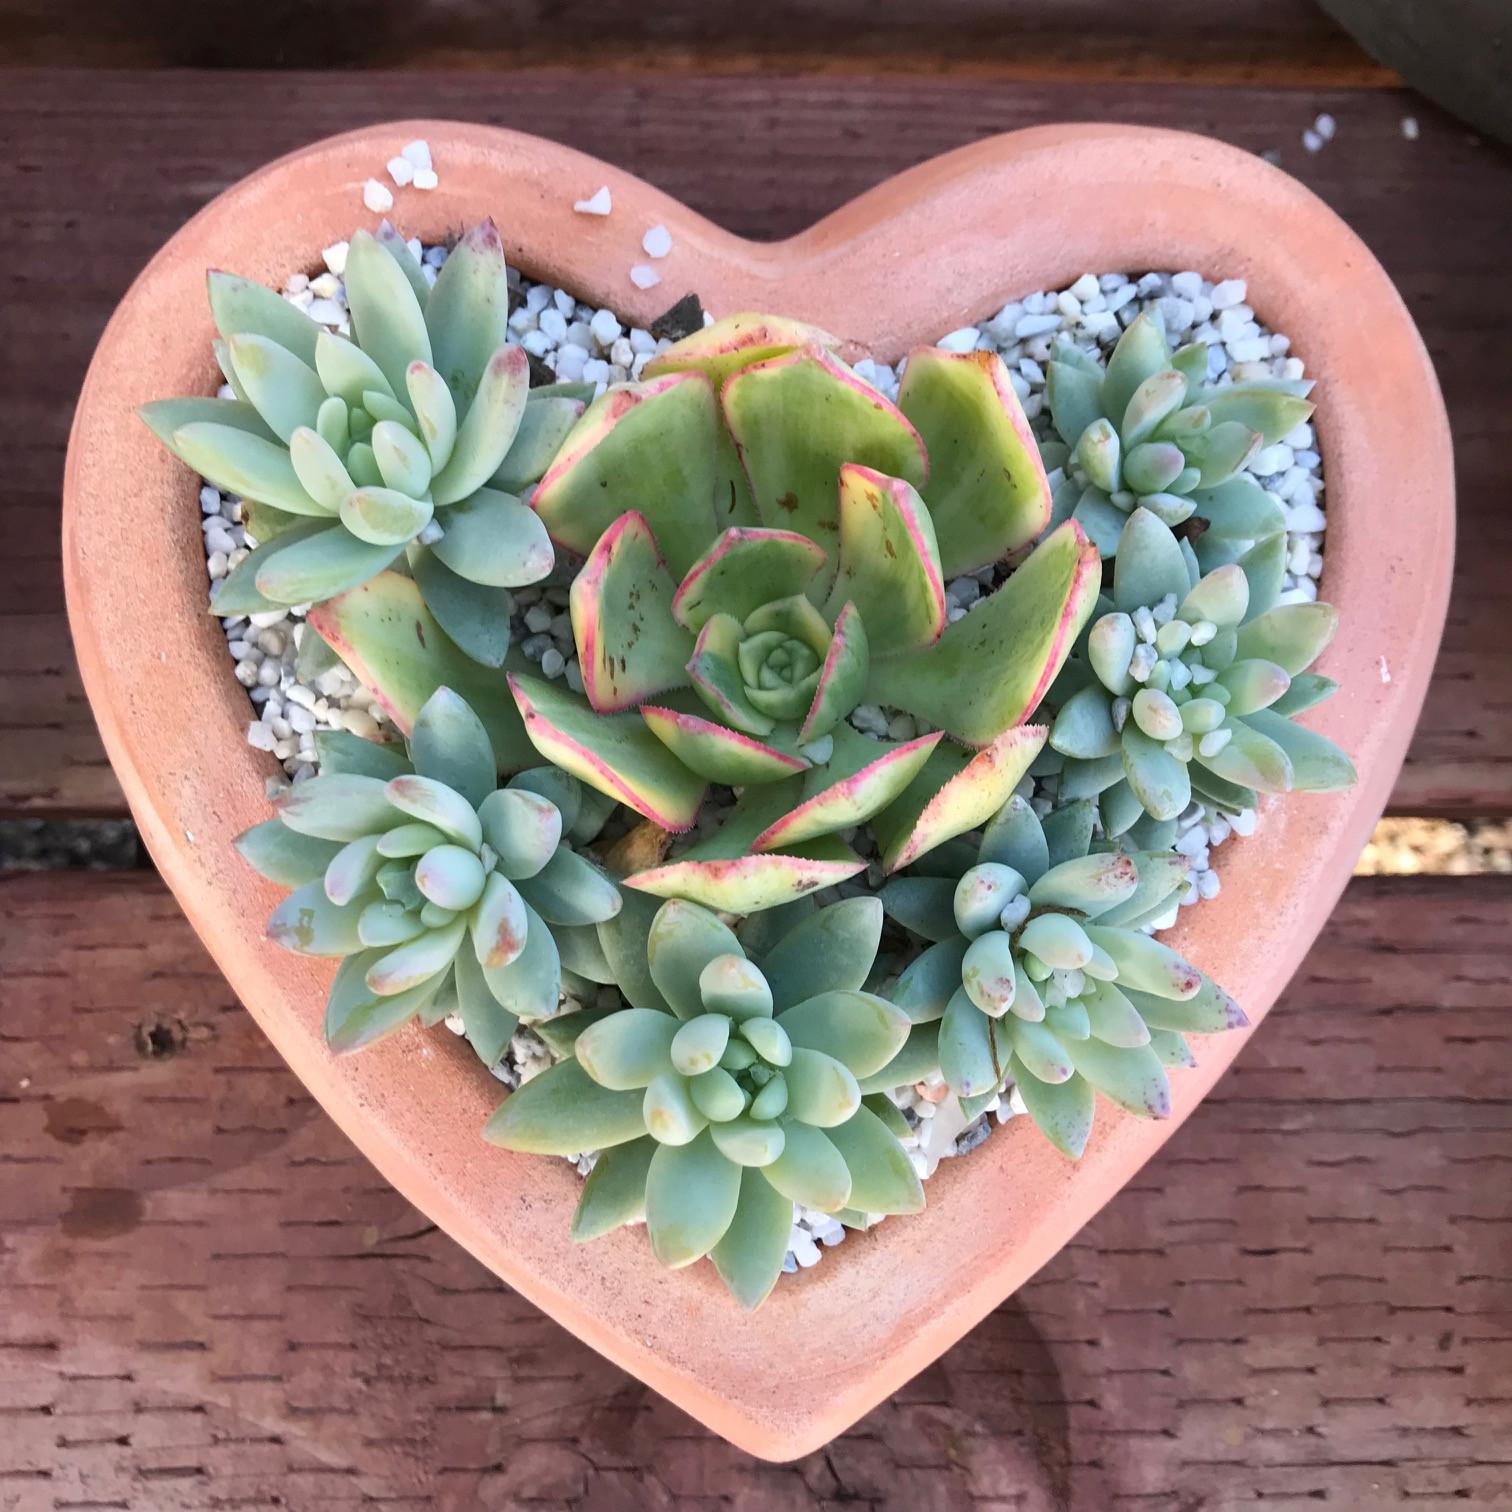 San Diego Gifts Garden Gifts Encinitas Nursery